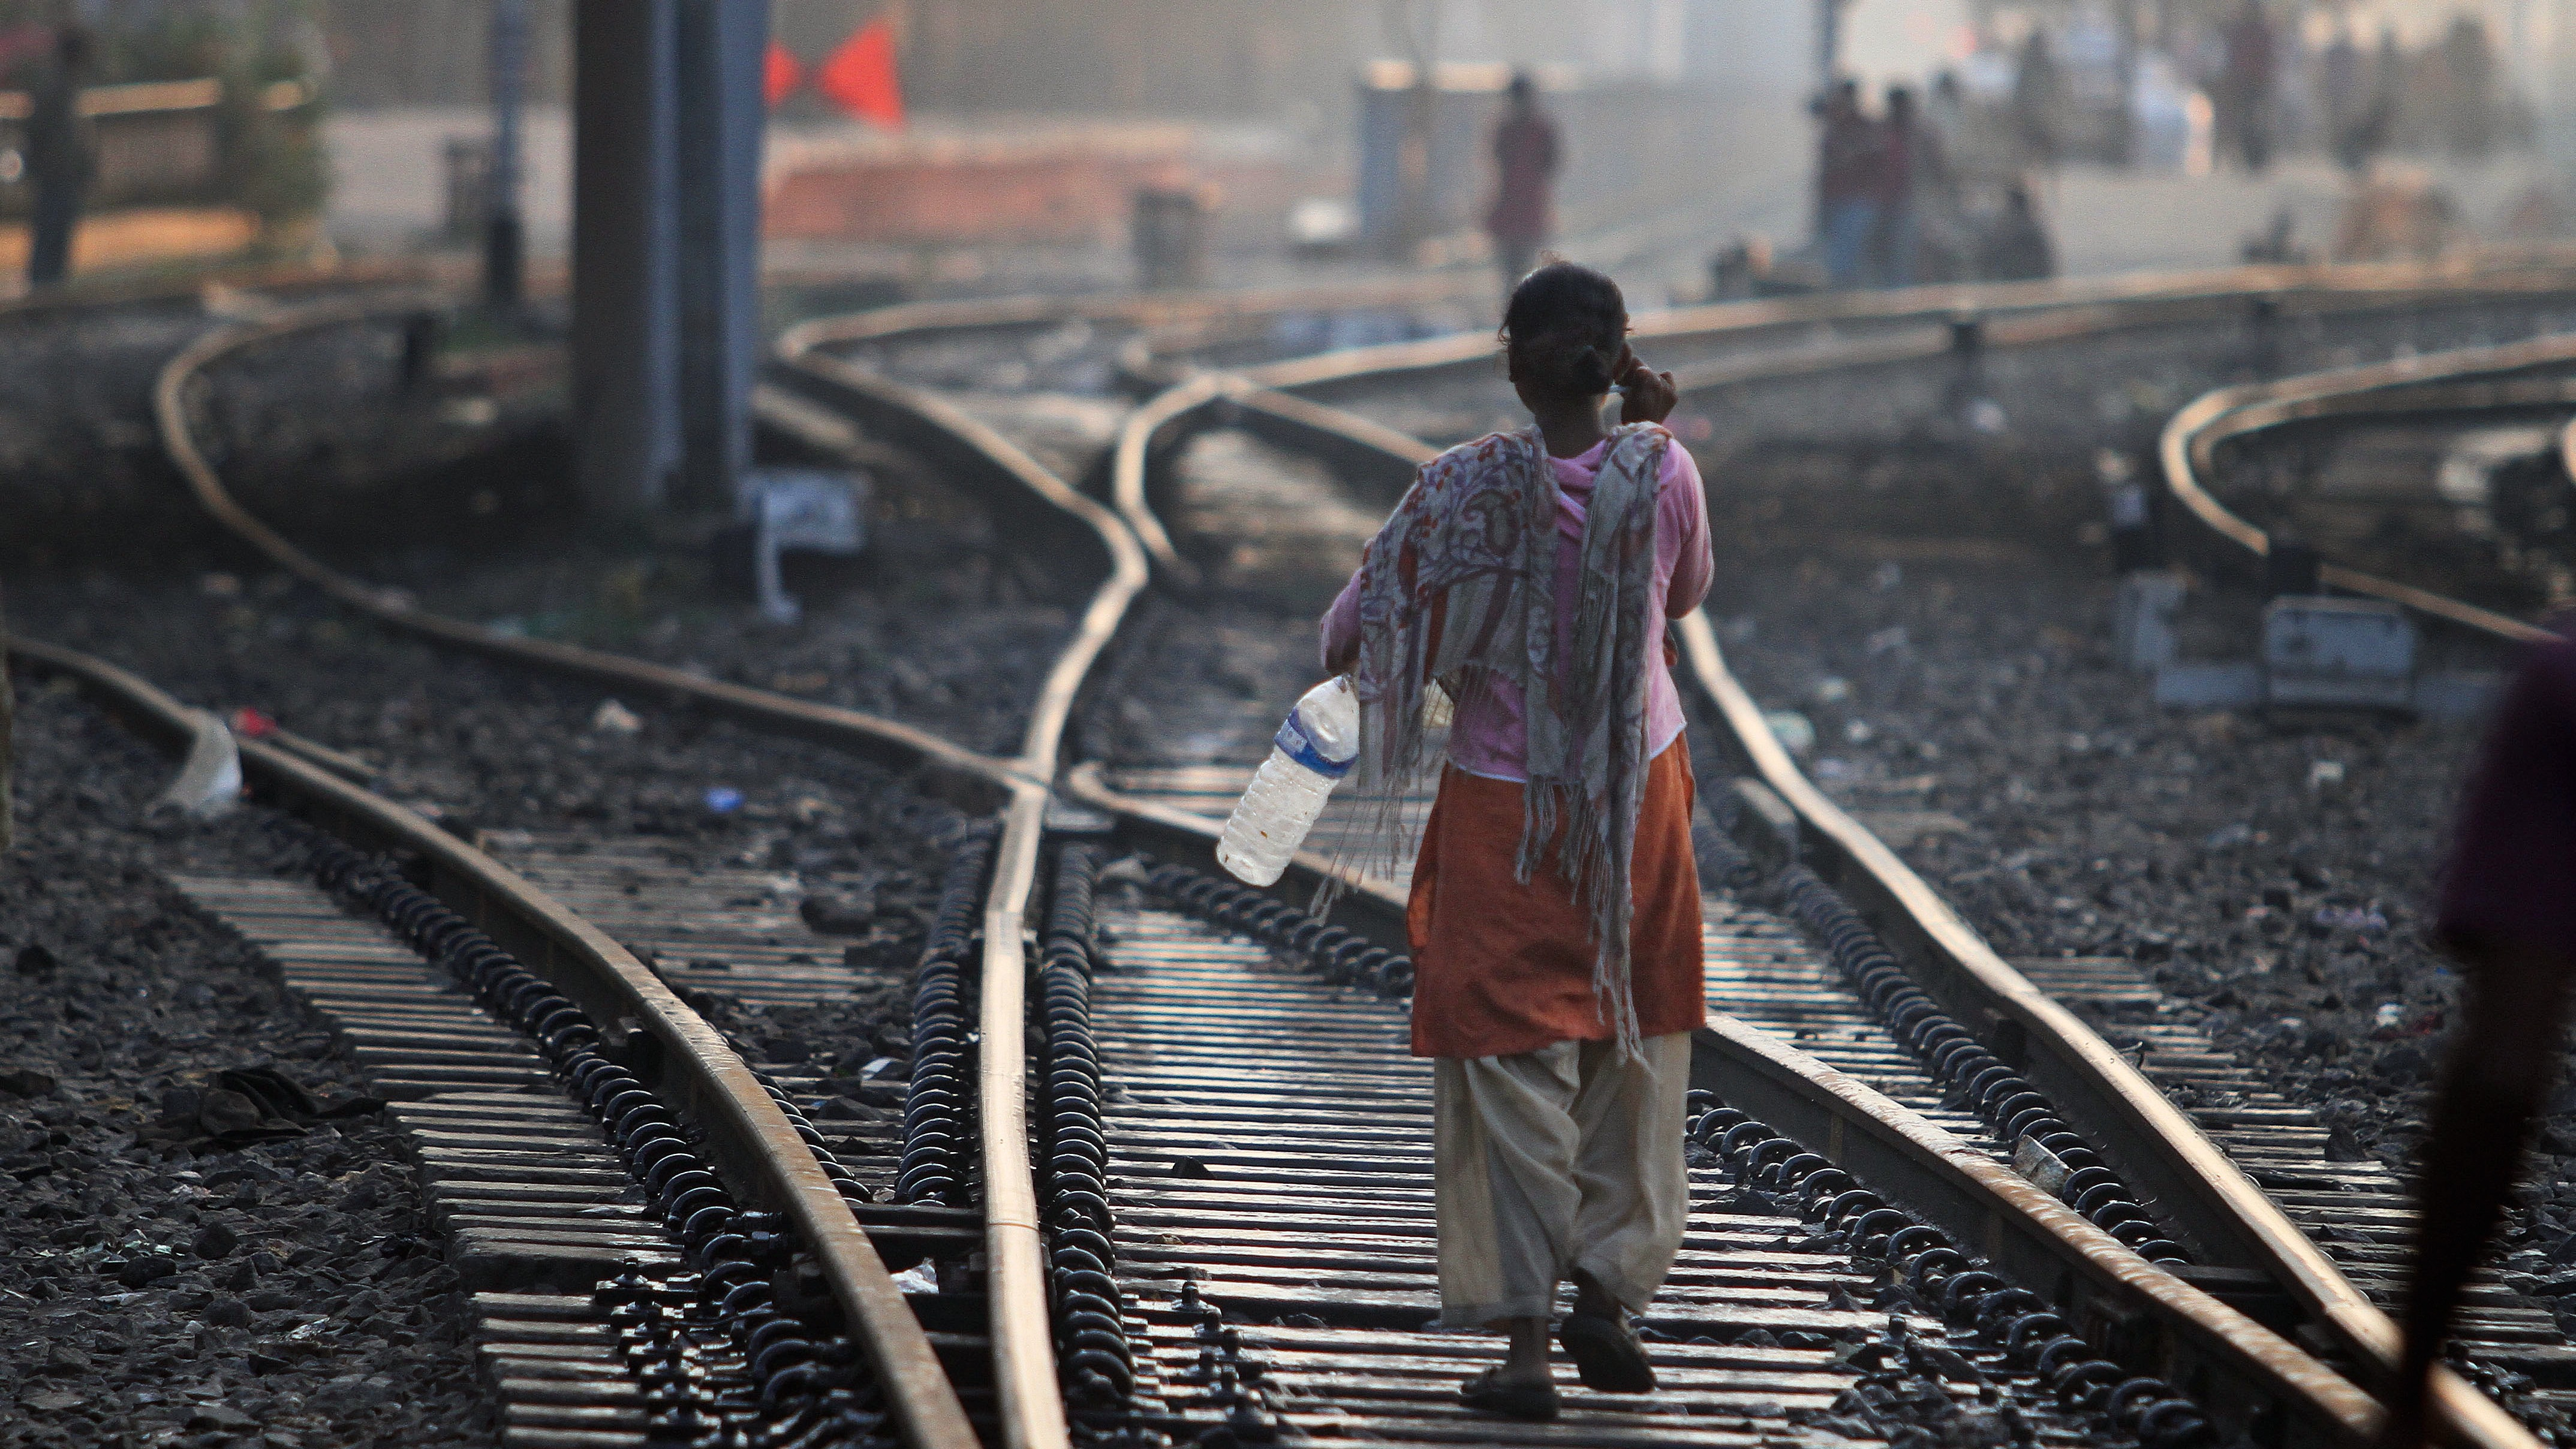 India Open Defecation Problem